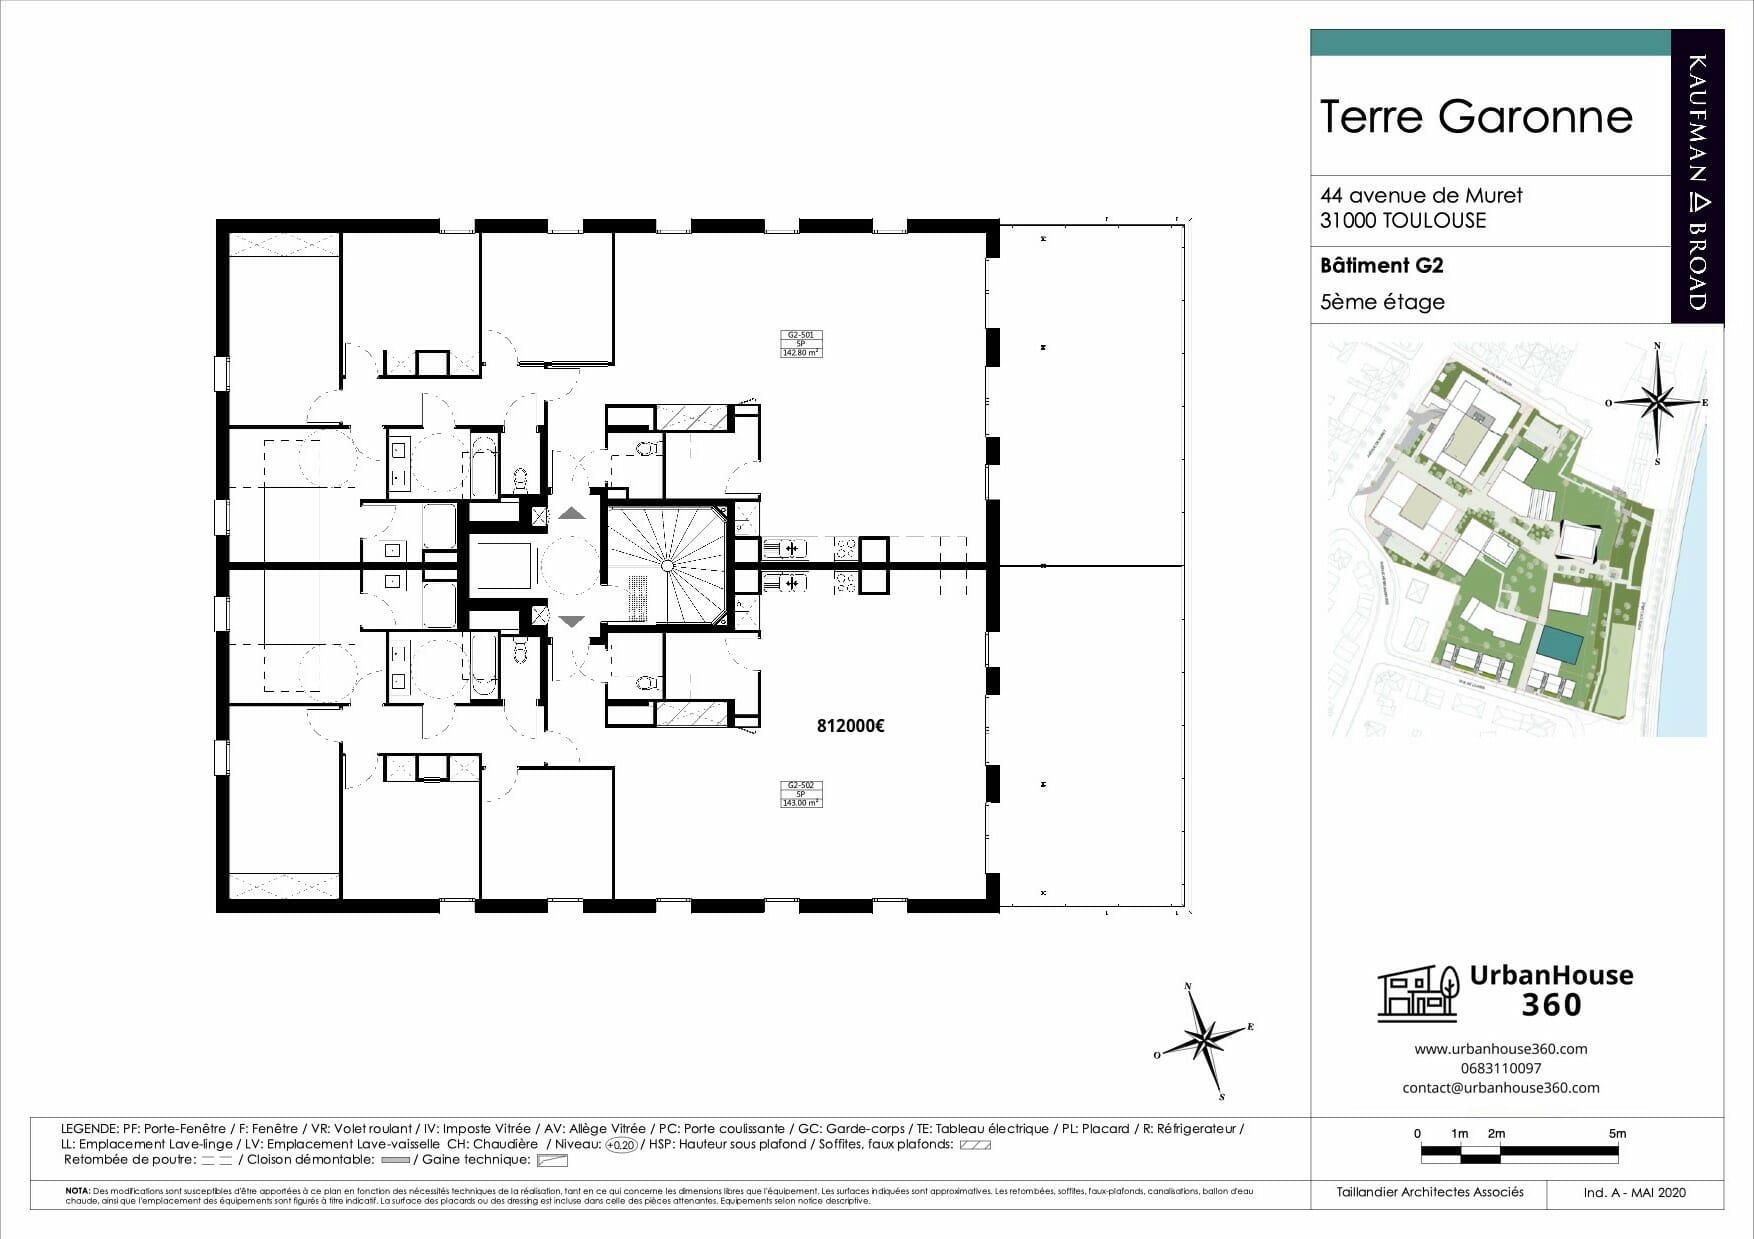 Urbanhouse360-Kaufman-Broad-Terre-Garonne_G2-R+5_2D 2